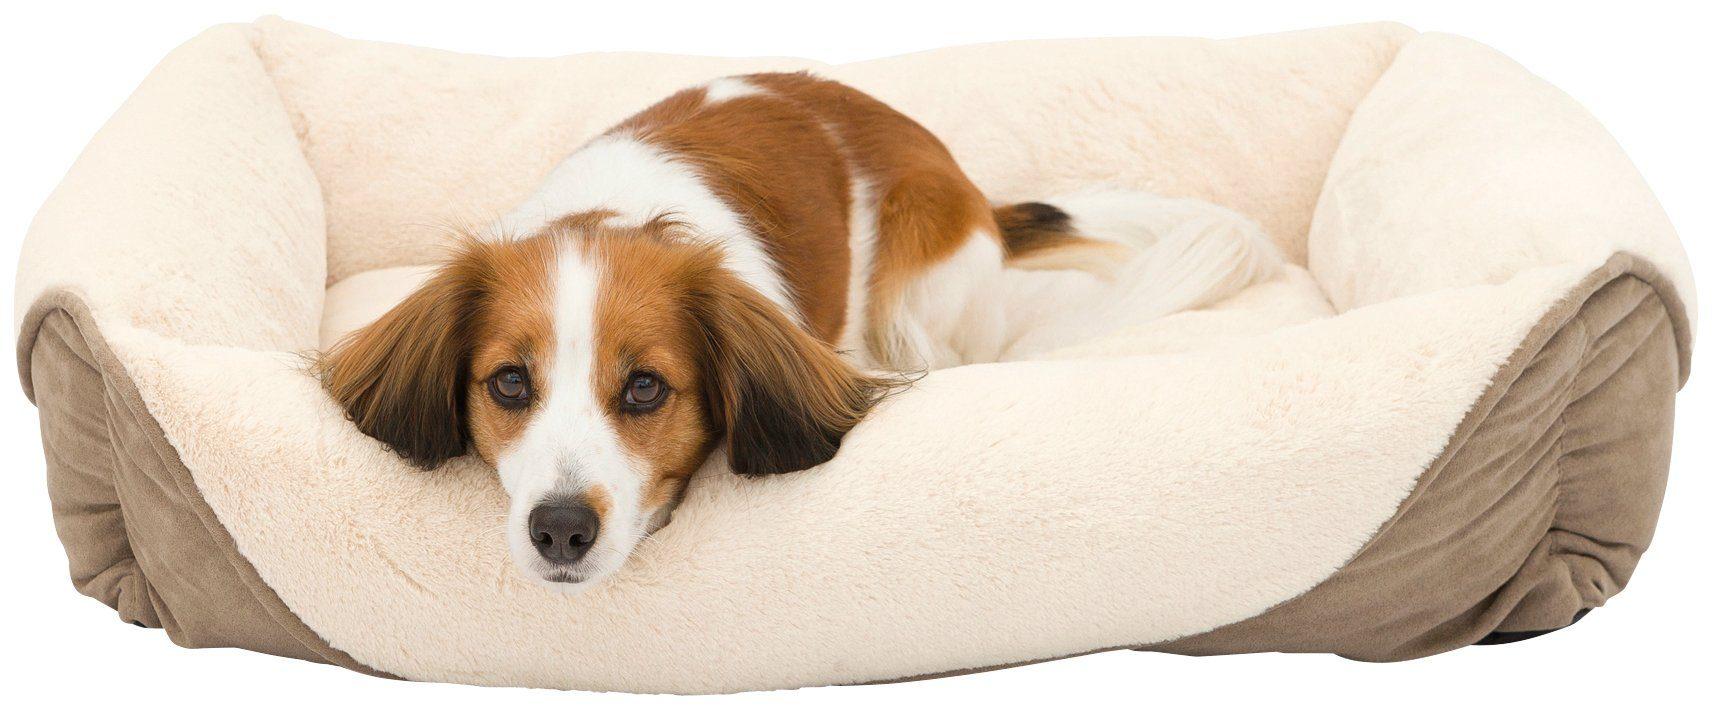 TRIXIE Hunde-Bett »Pippa«, BxL: 80x65 cm